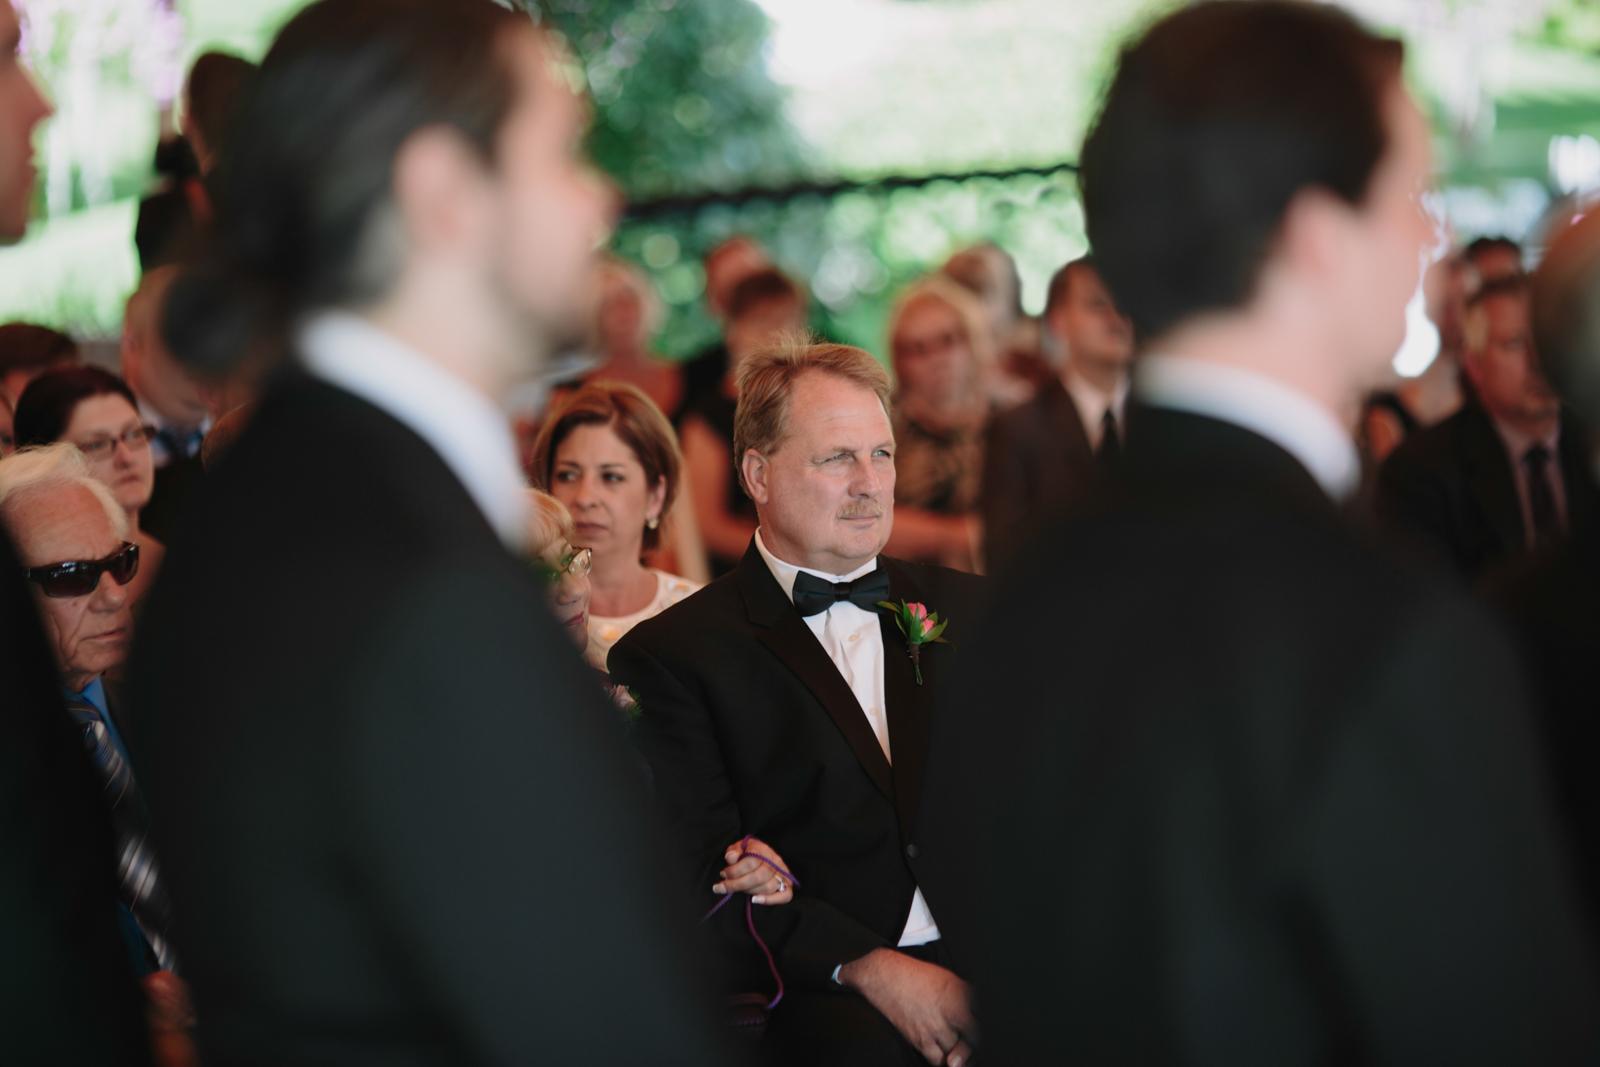 Northern Michigan Grand Traverse Resort Black Tie Wedding Photographer - Codee and Aaron-015.jpg